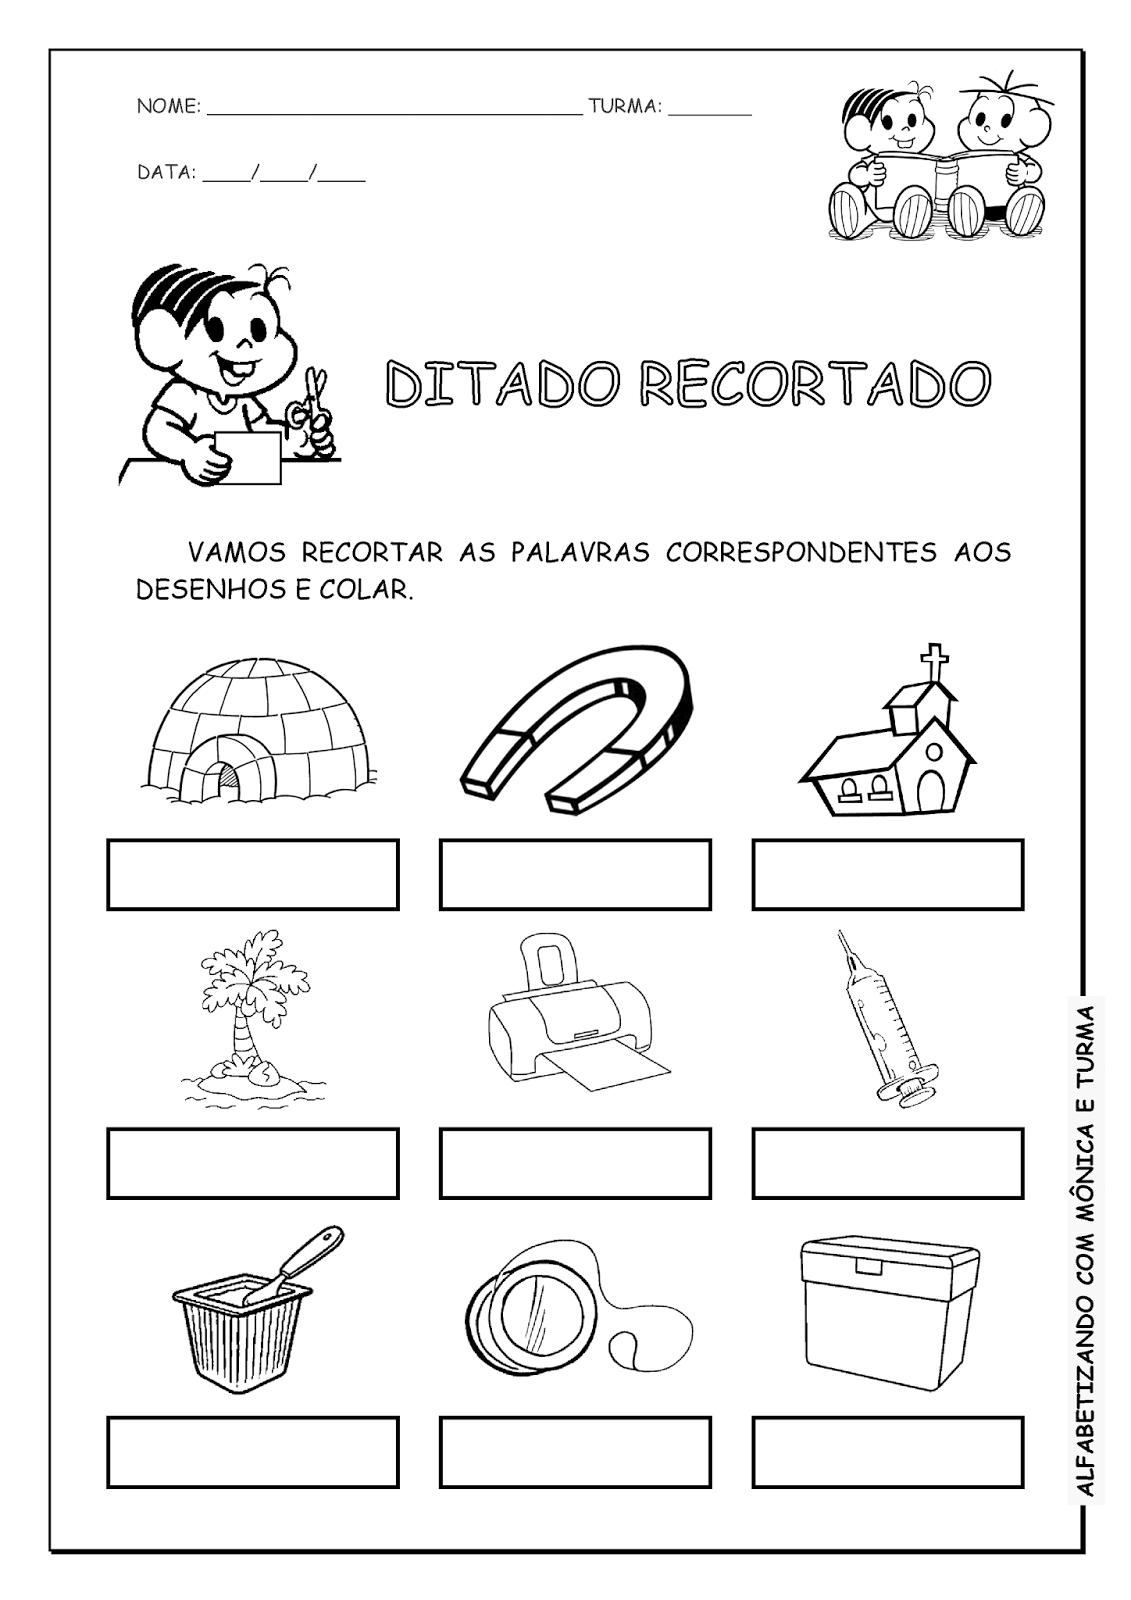 1000+ images about ATIVIDADES EDUCAÇÃO INFANTIL on Pinterest